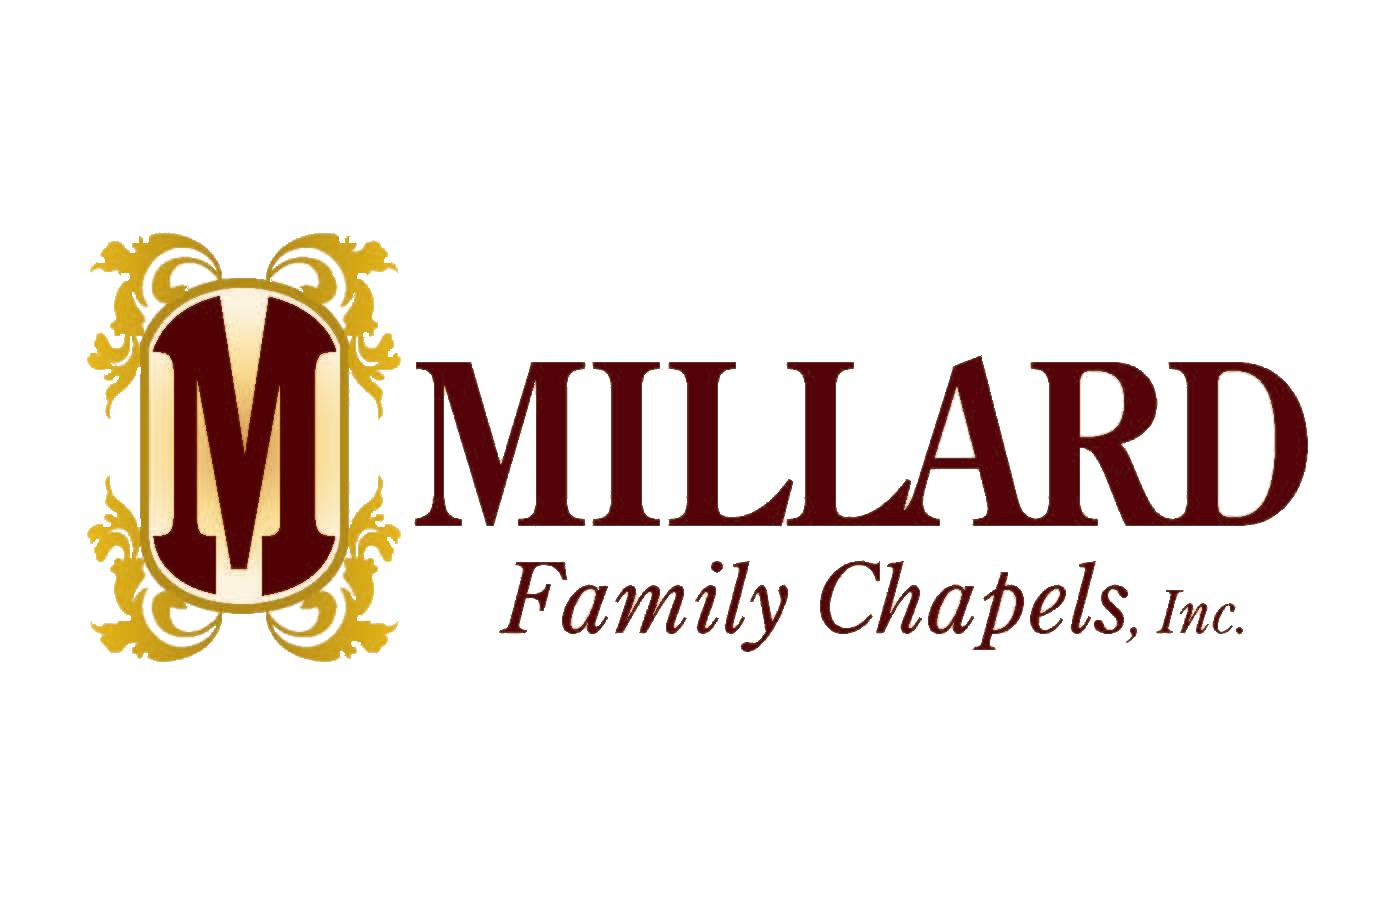 Millard-Rekus Family Funeral Chapel